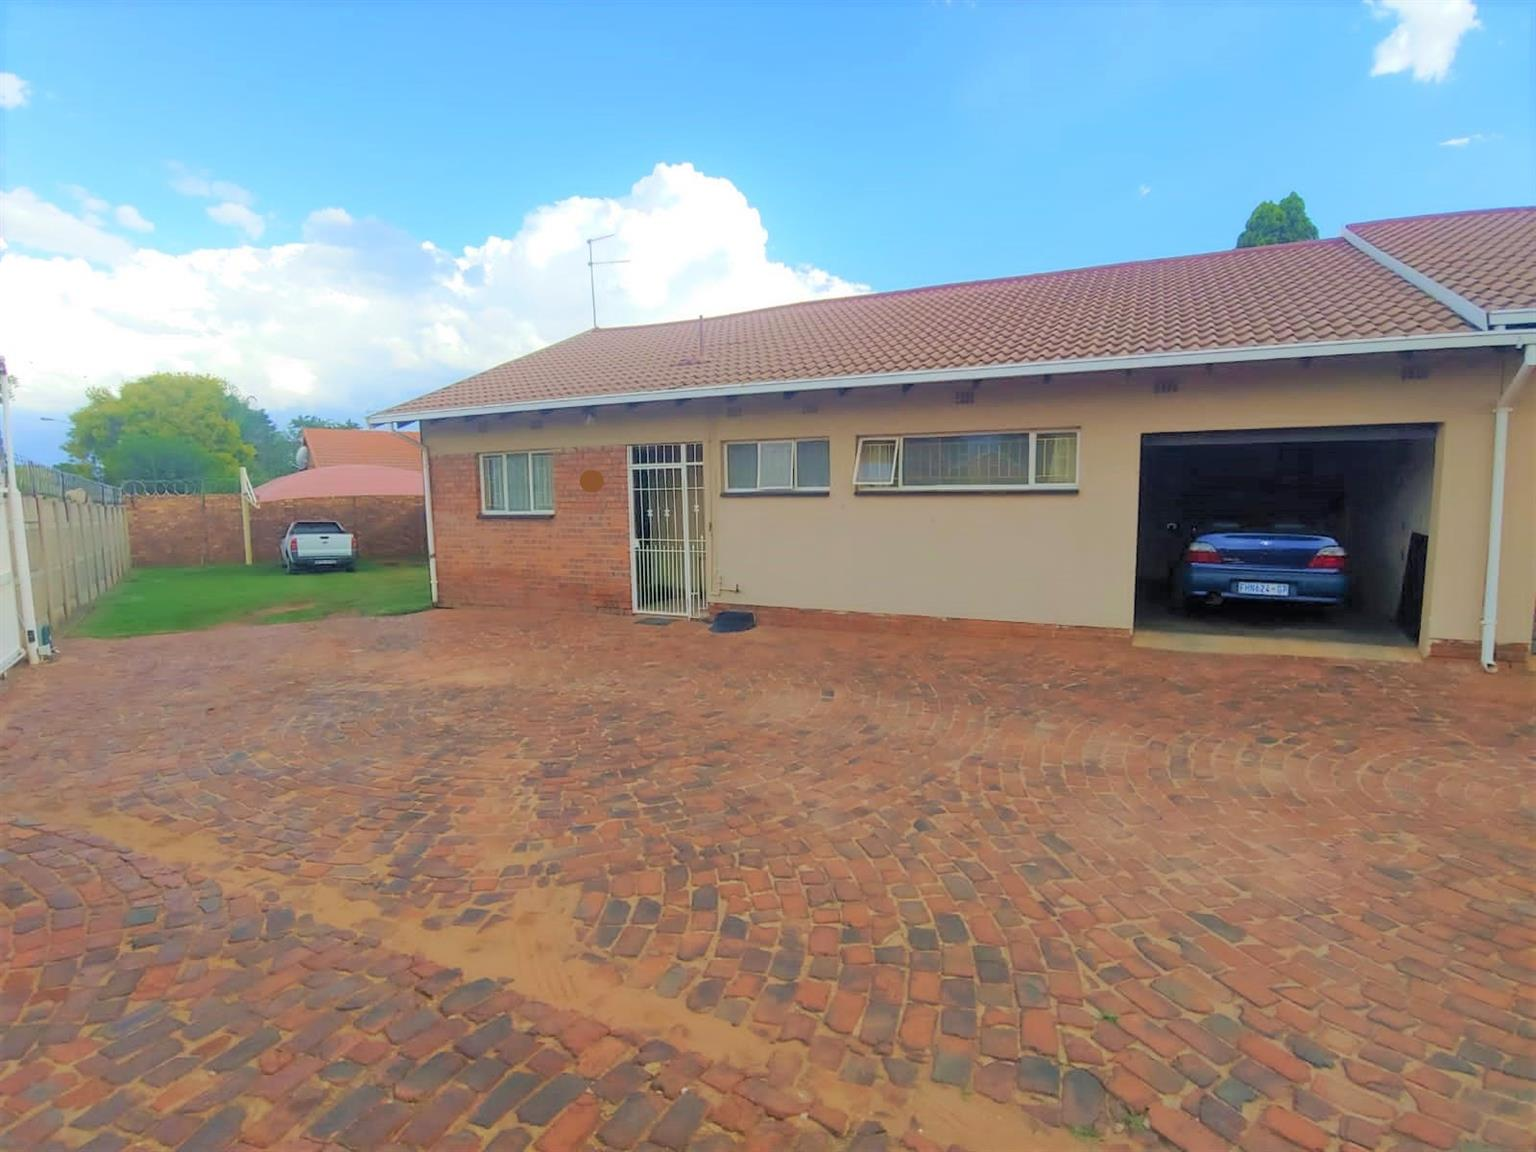 House For Sale in Dersley